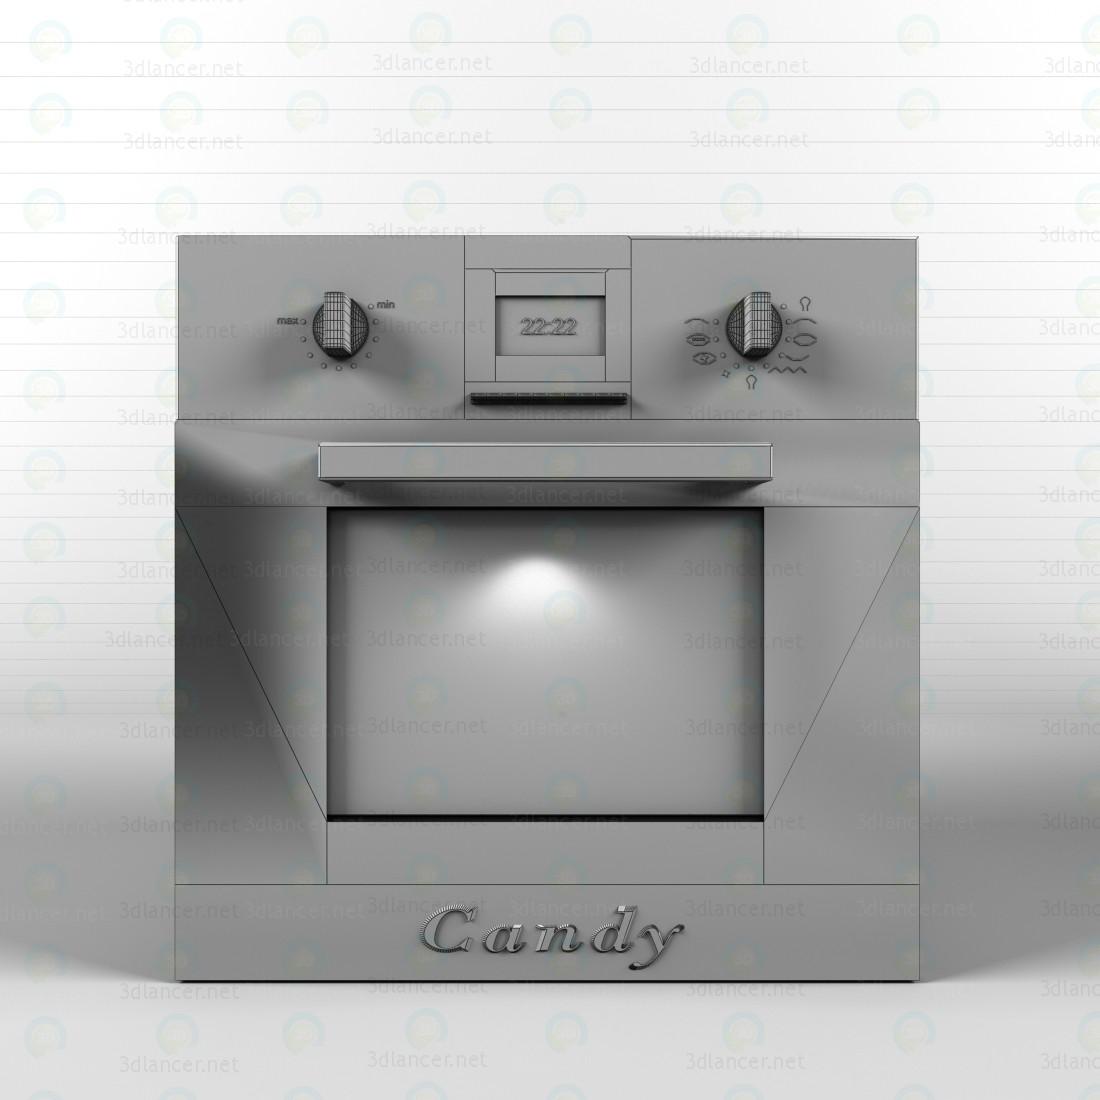 Horno, vitrocerámica, campana extractora 3D modelo Compro - render